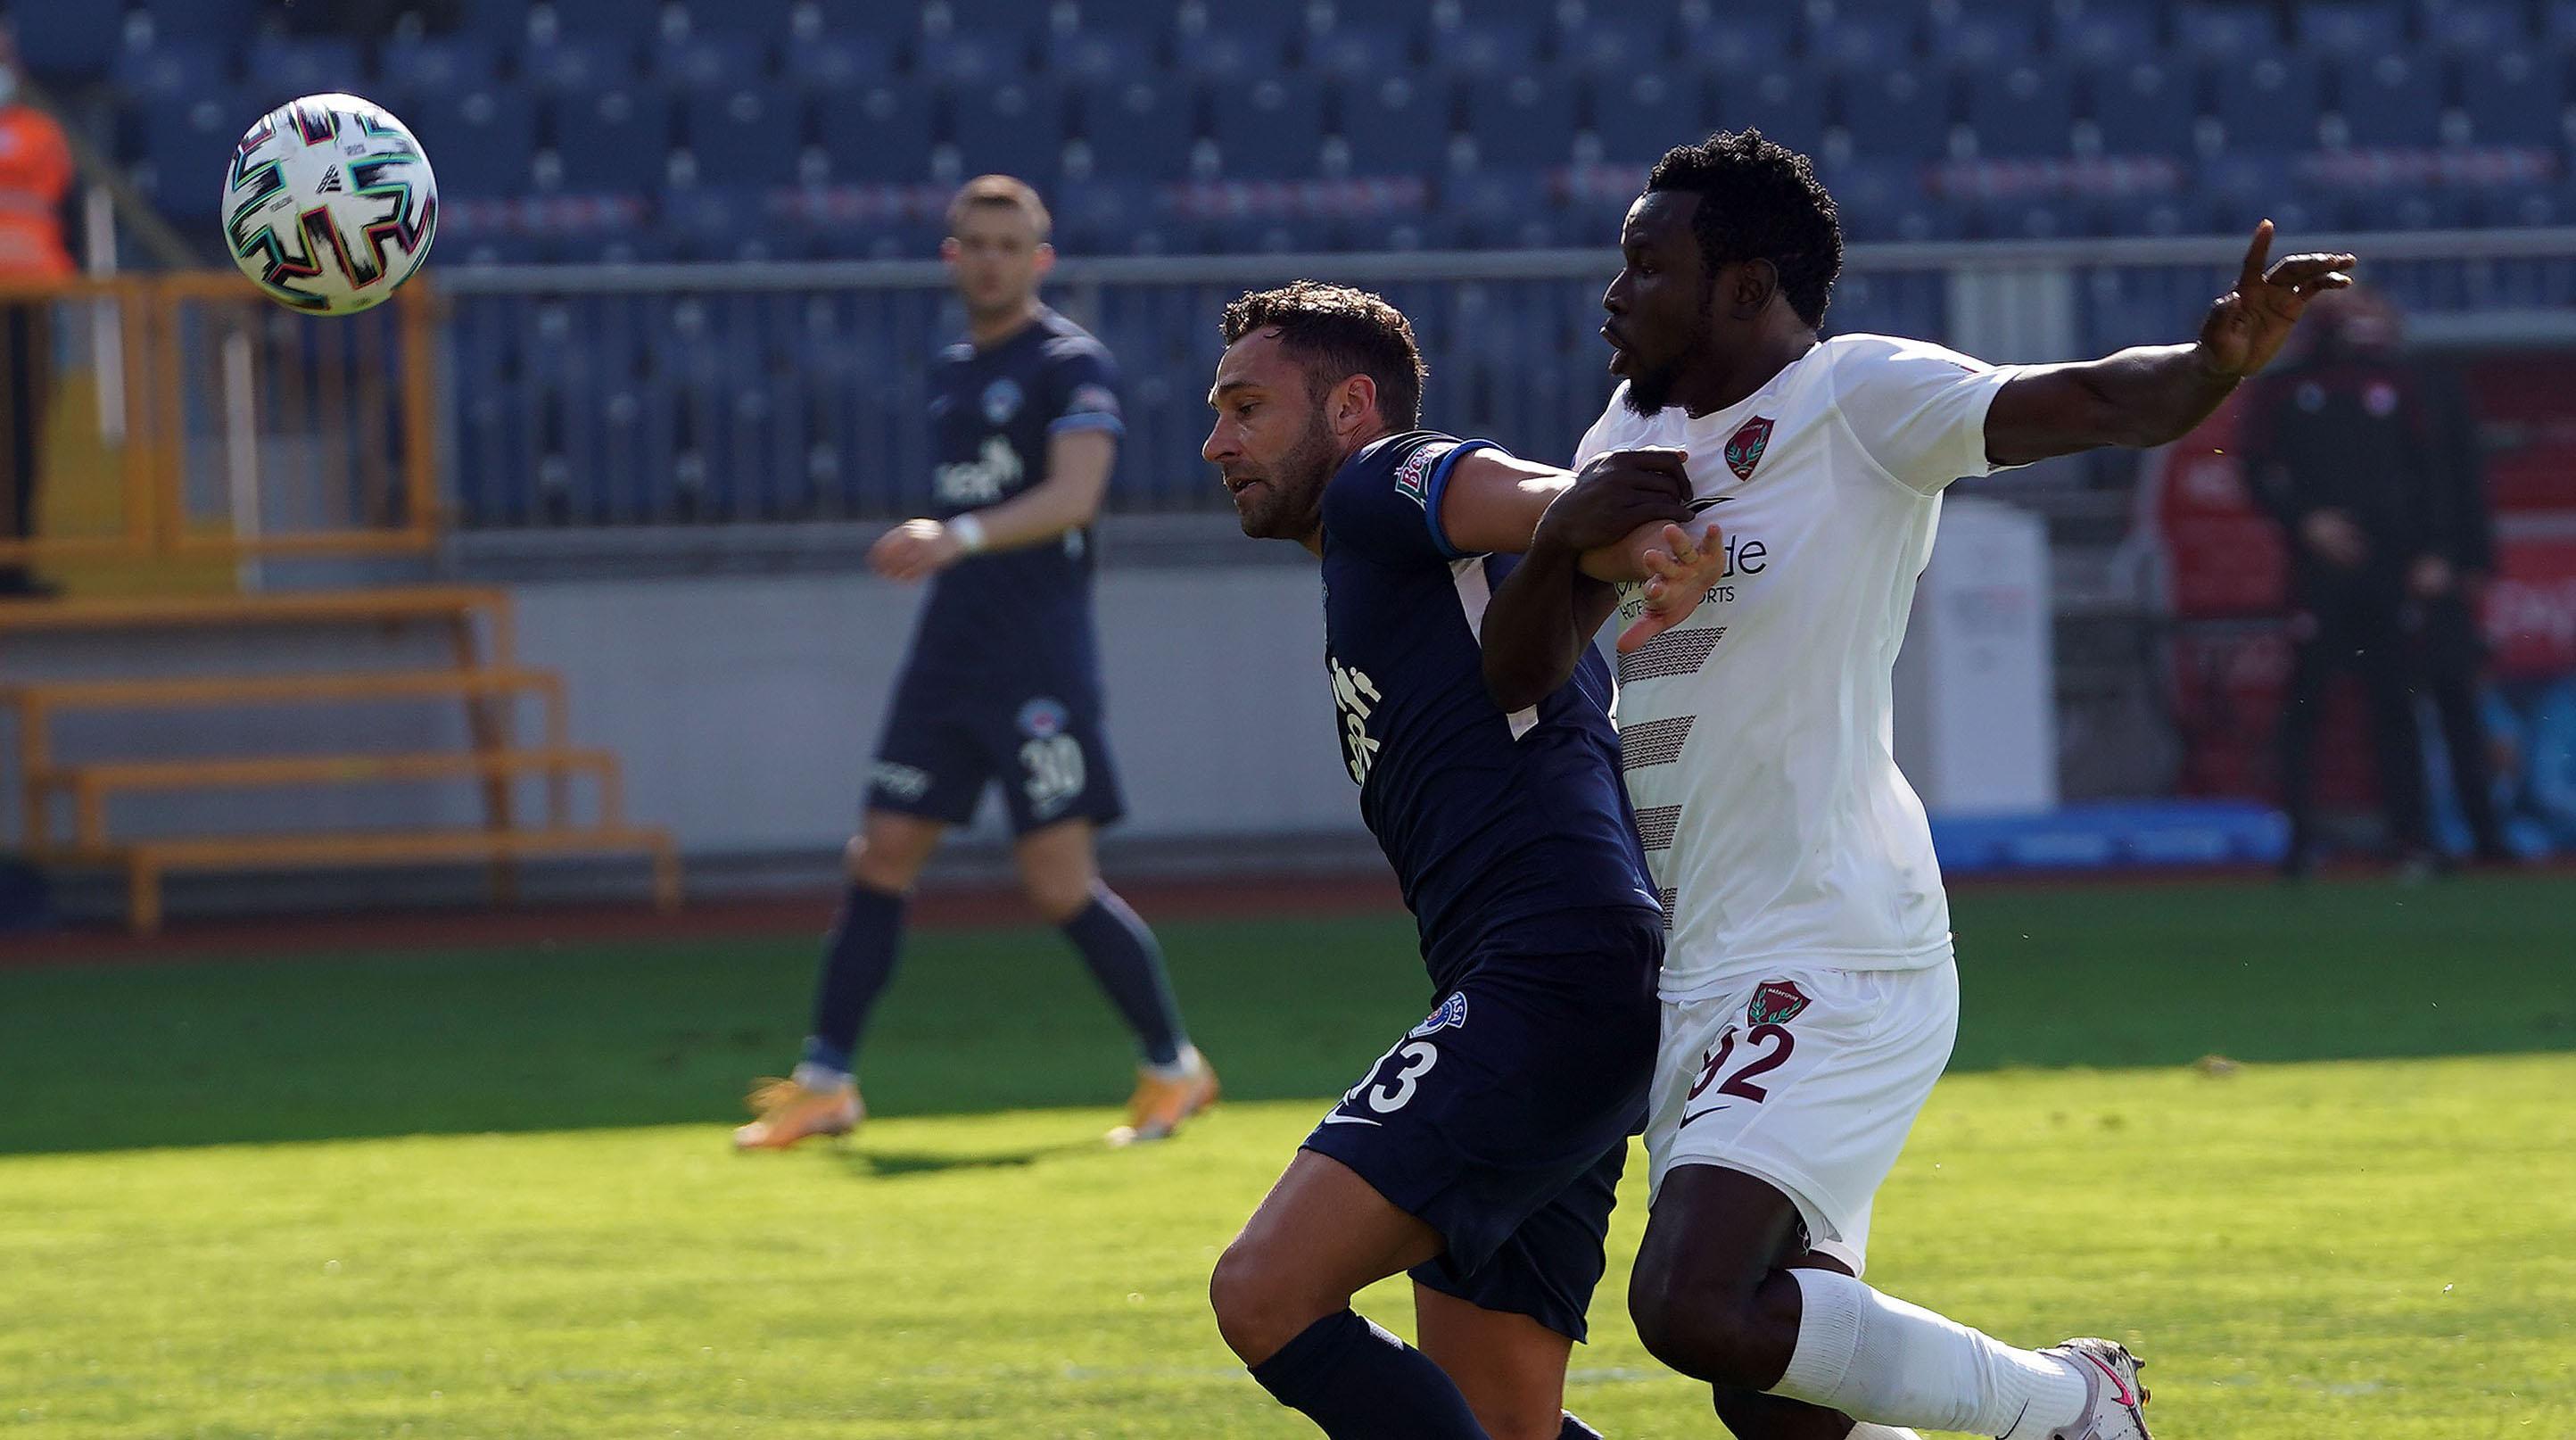 Süper Lig: Kasımpaşa: 1 - A.Hatayspor: 4